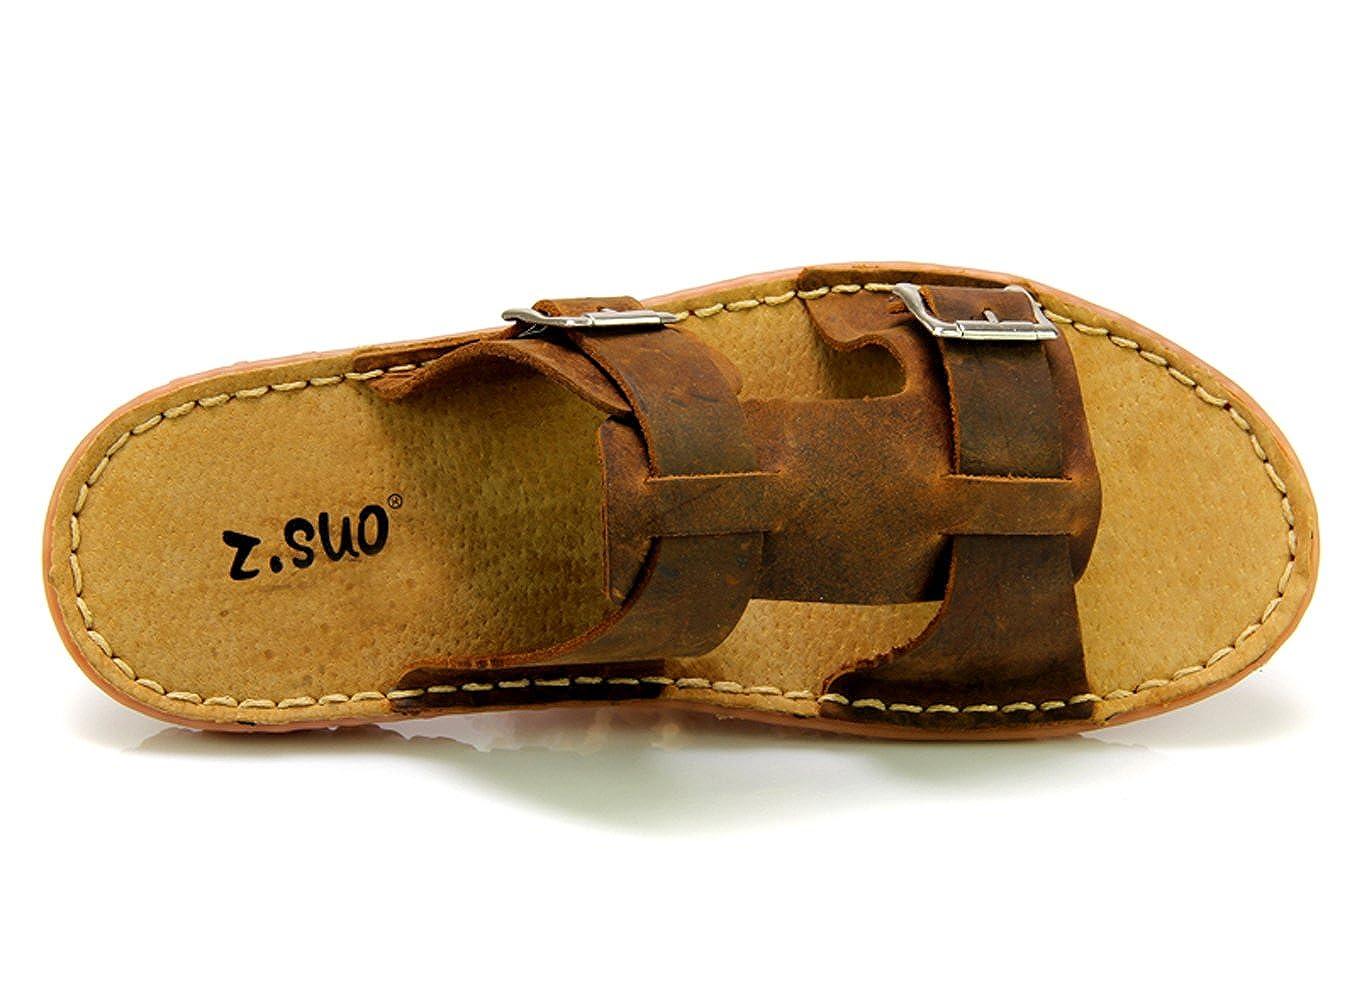 DQQ Uomo in Pelle Crazy Horse Side Slip On Sandalo, Marrone (Brown), 42.5